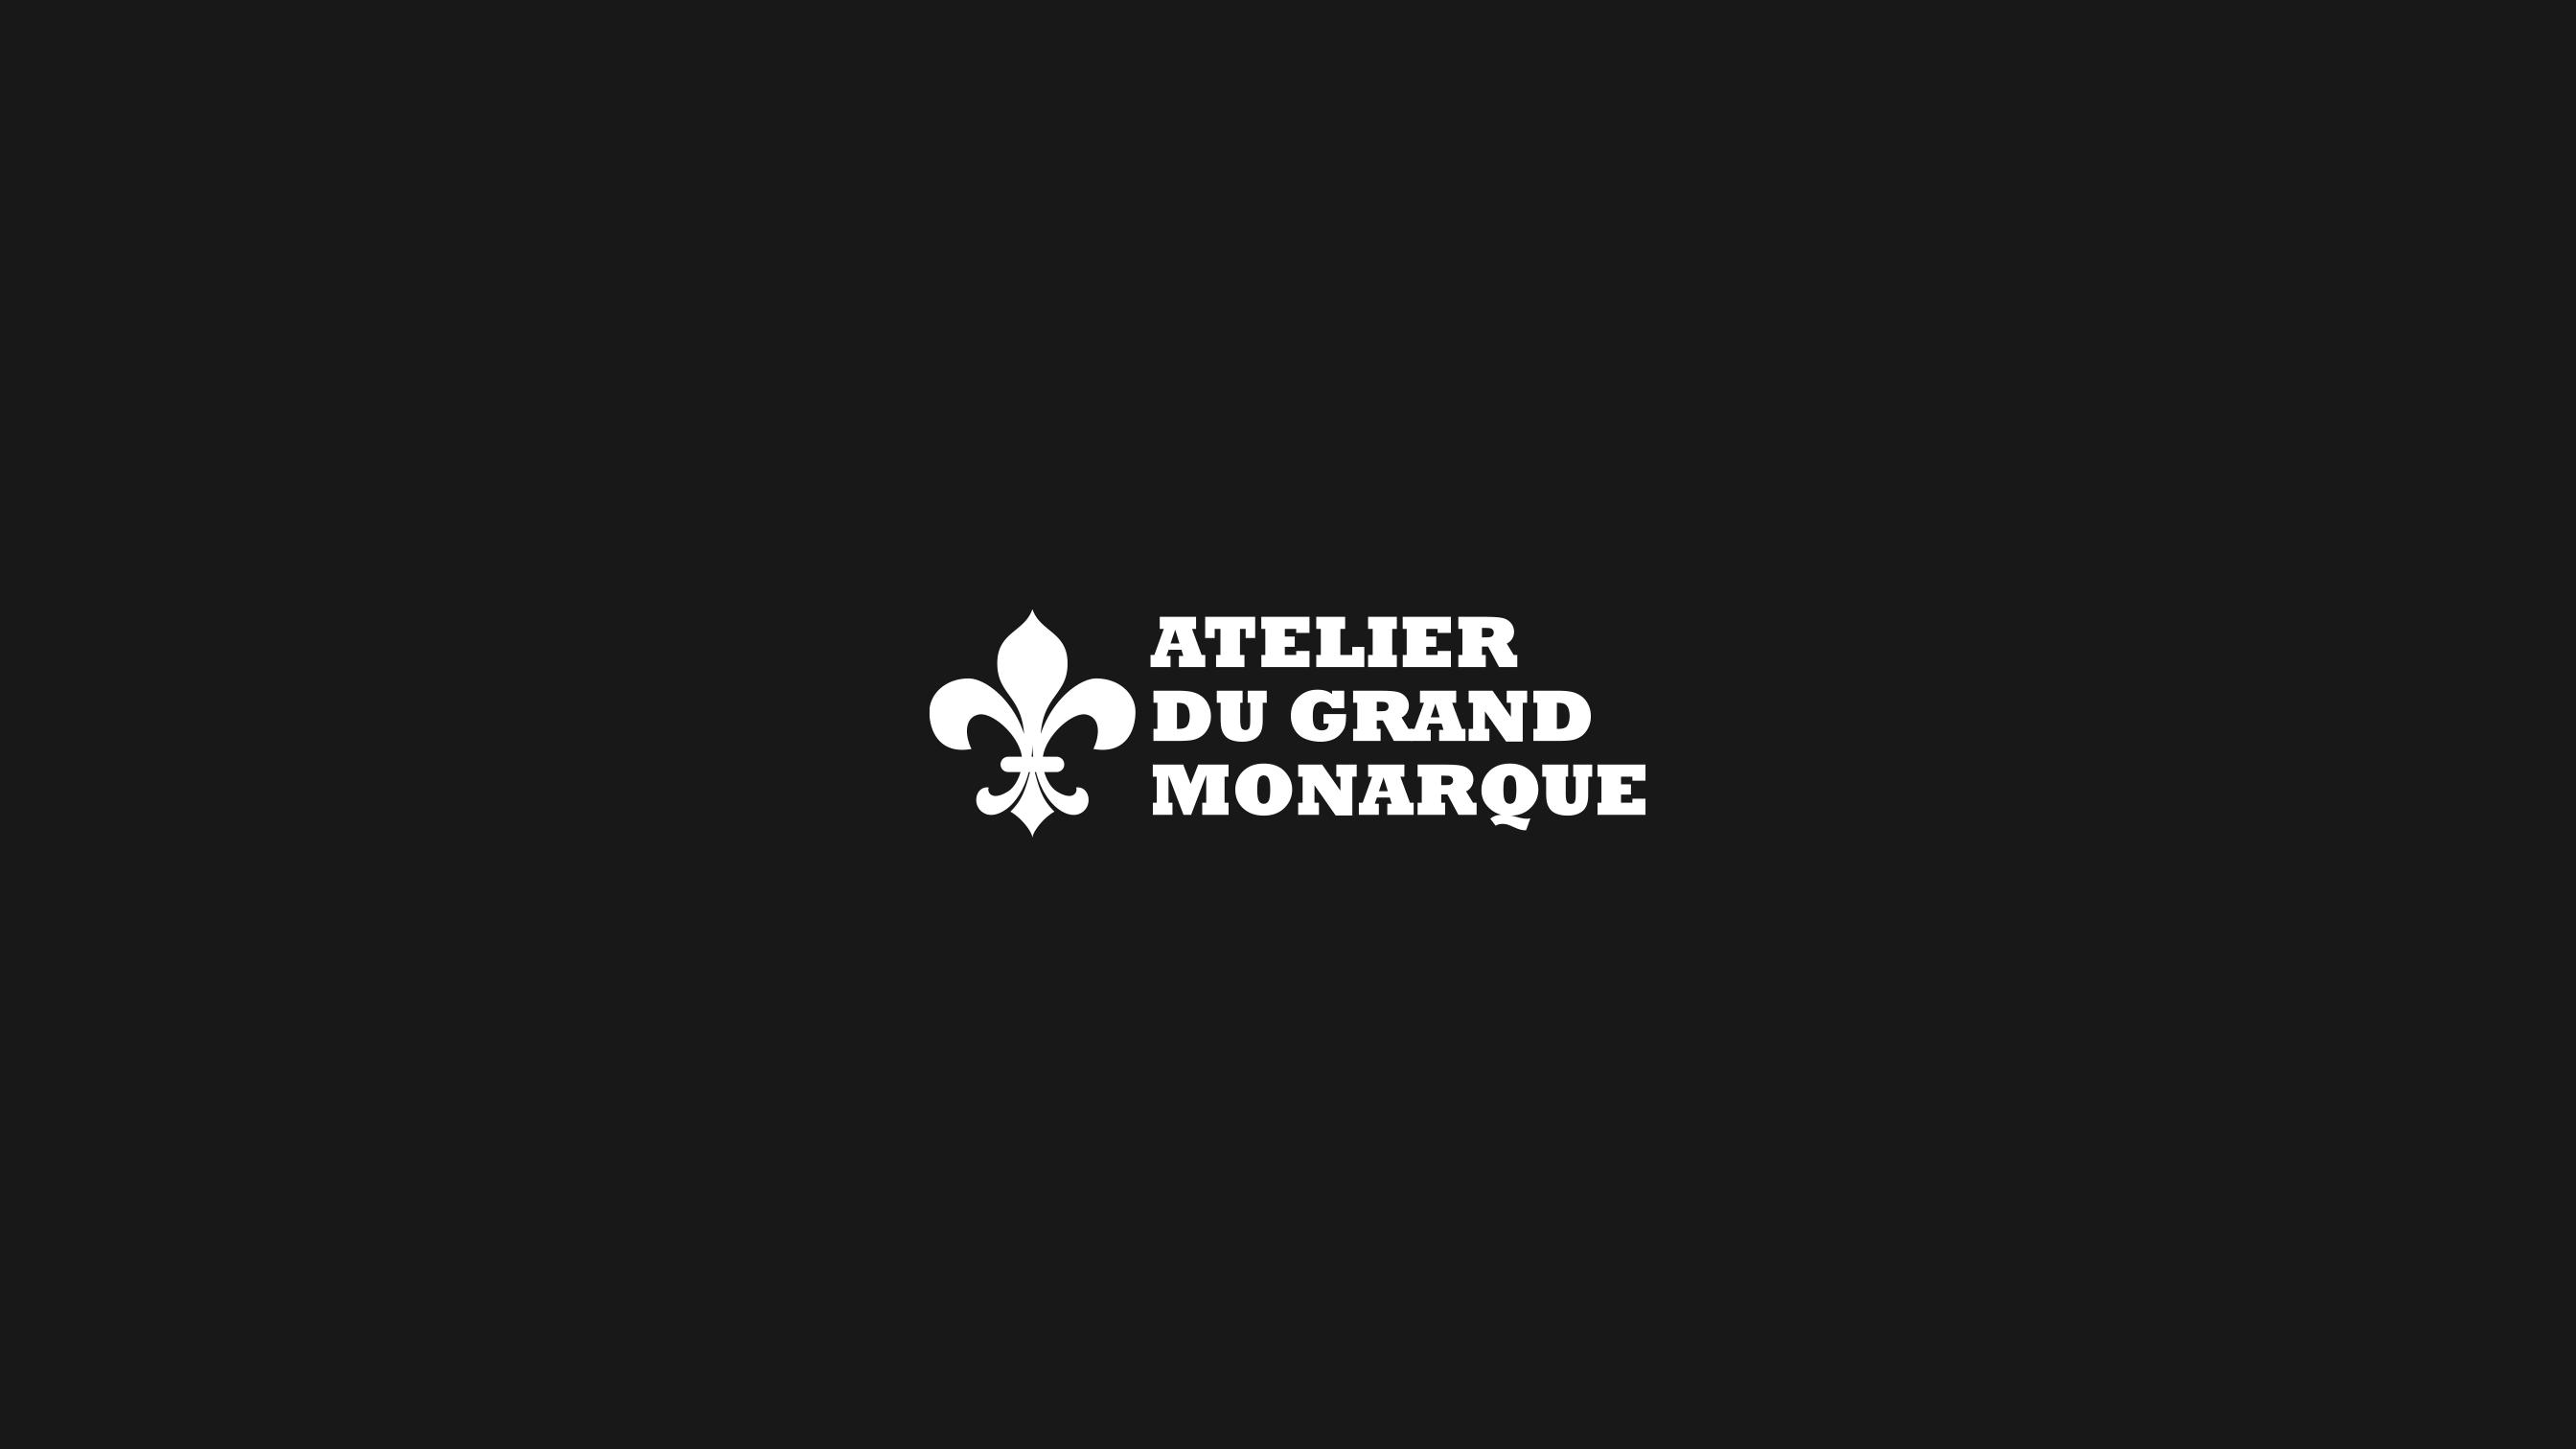 showcase-logotype-atelier-du-grand-monarque